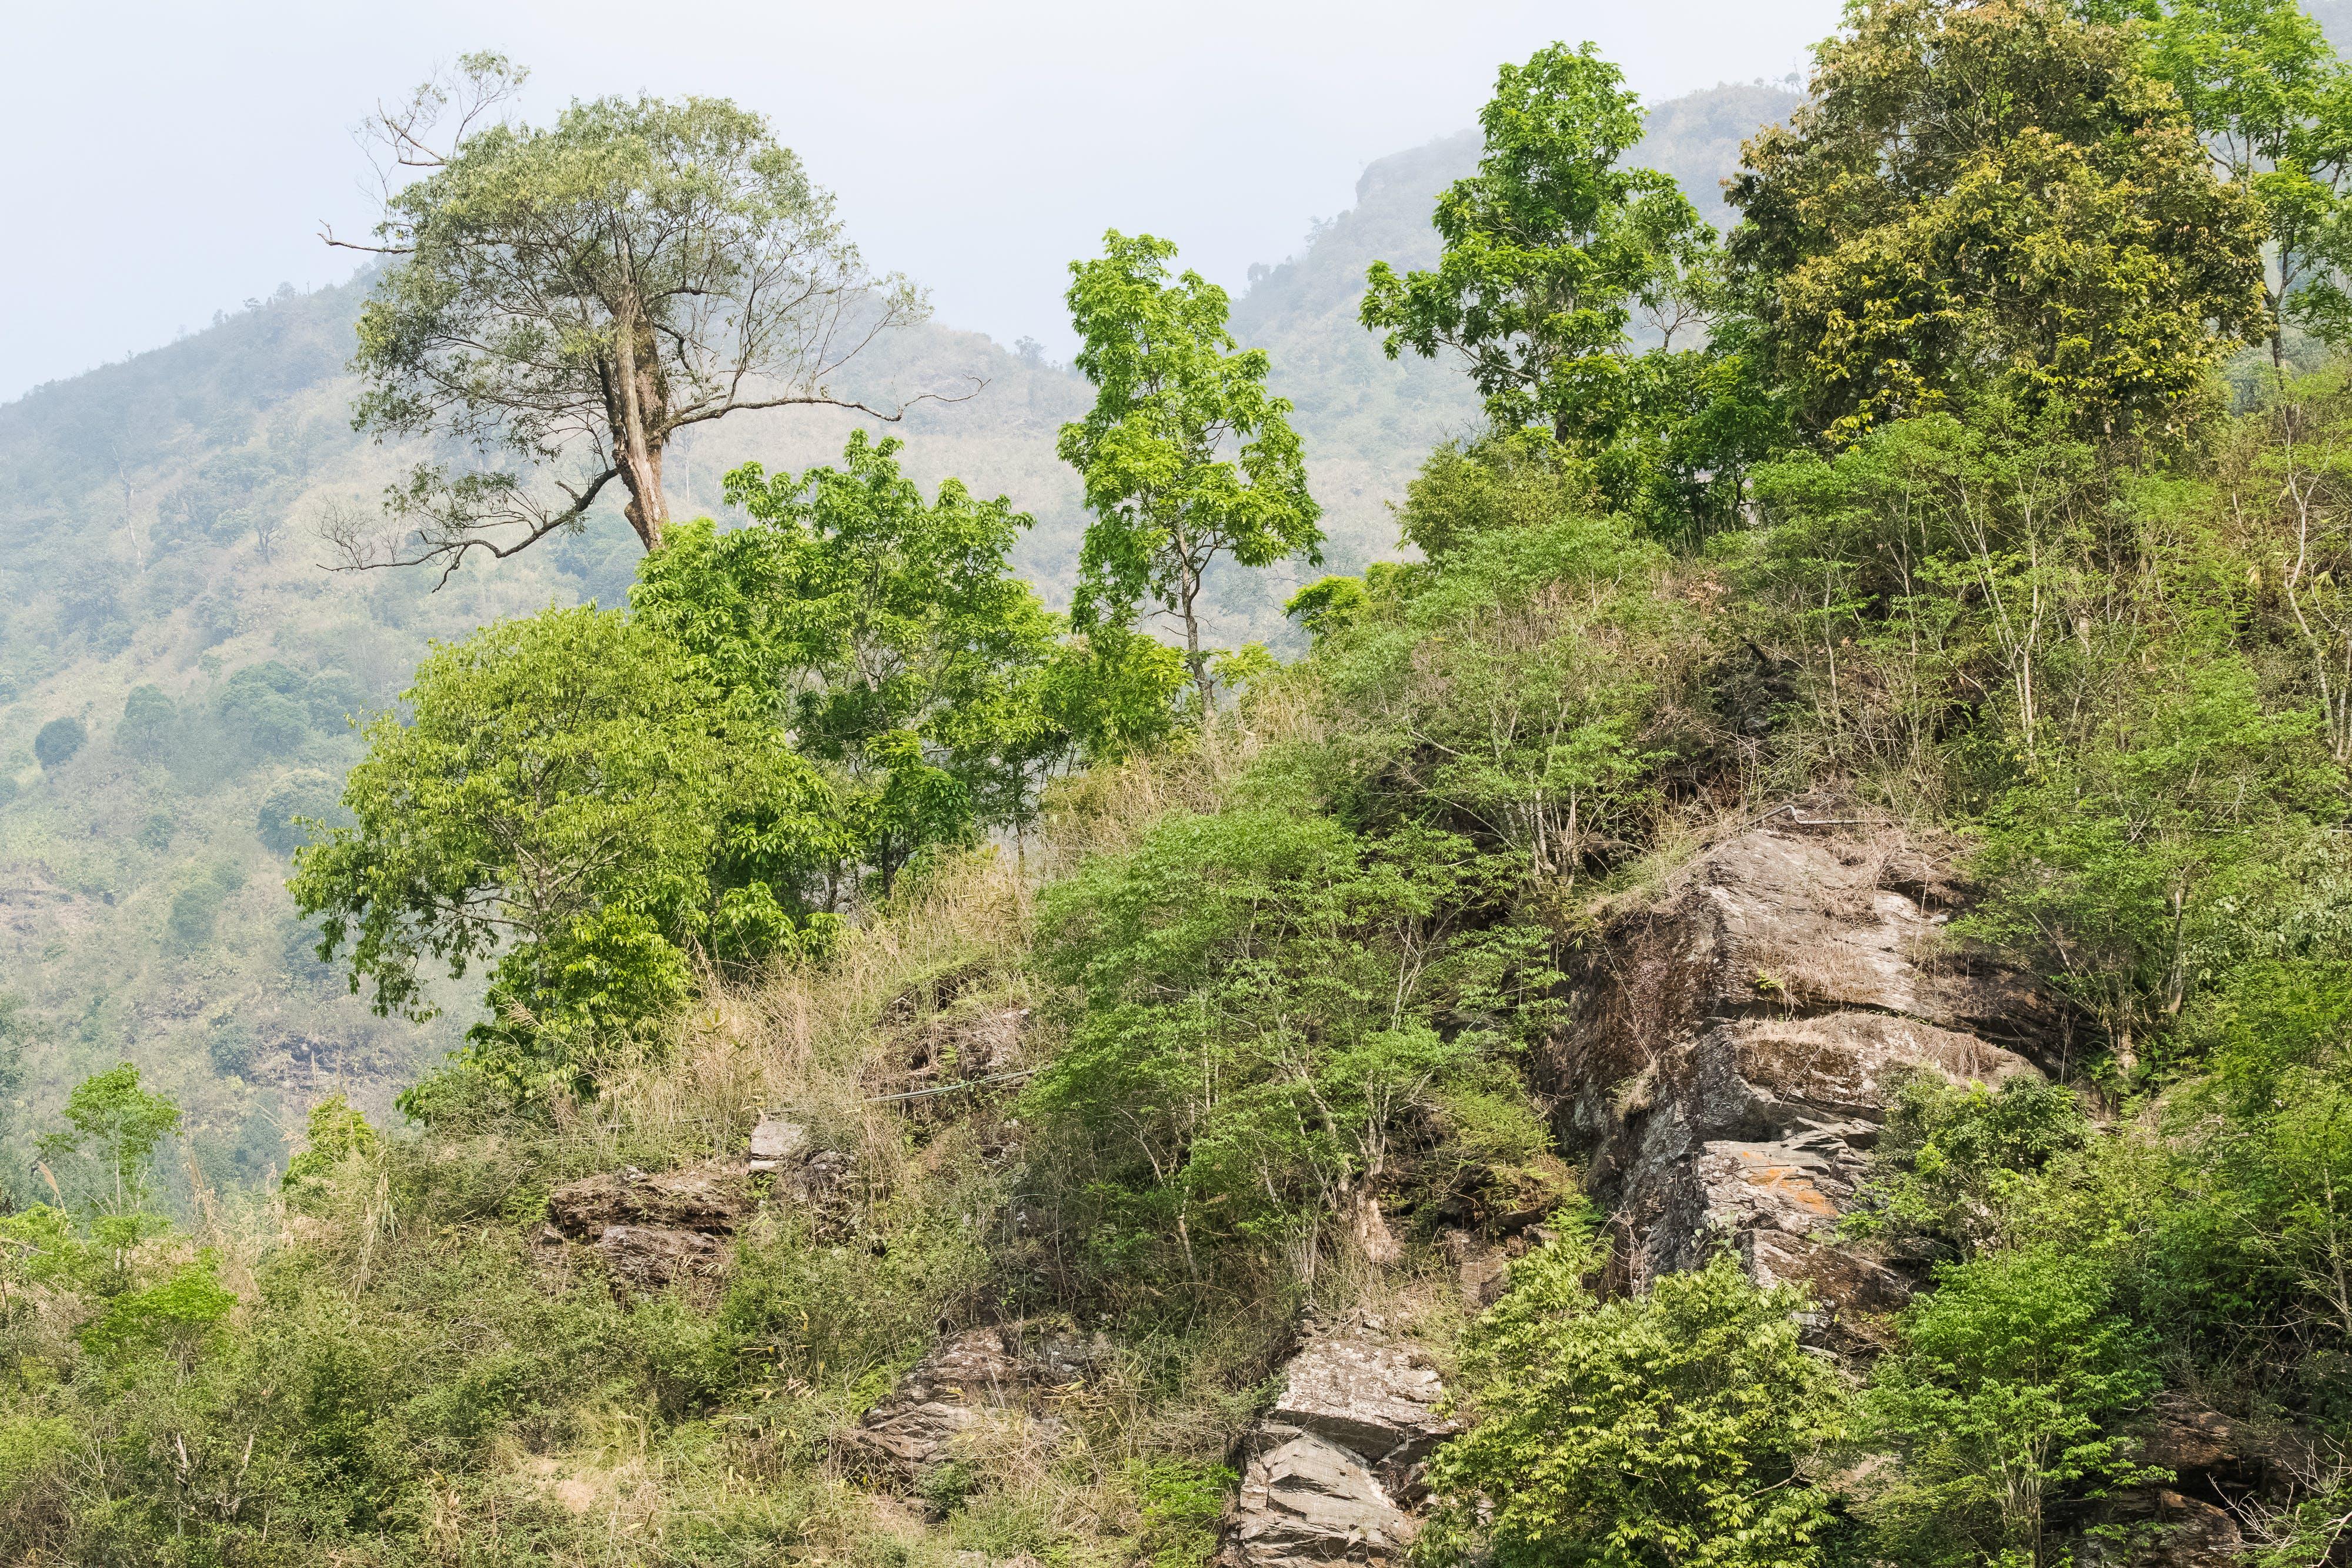 Kostenloses Stock Foto zu baum, berg, himalaya, hügel